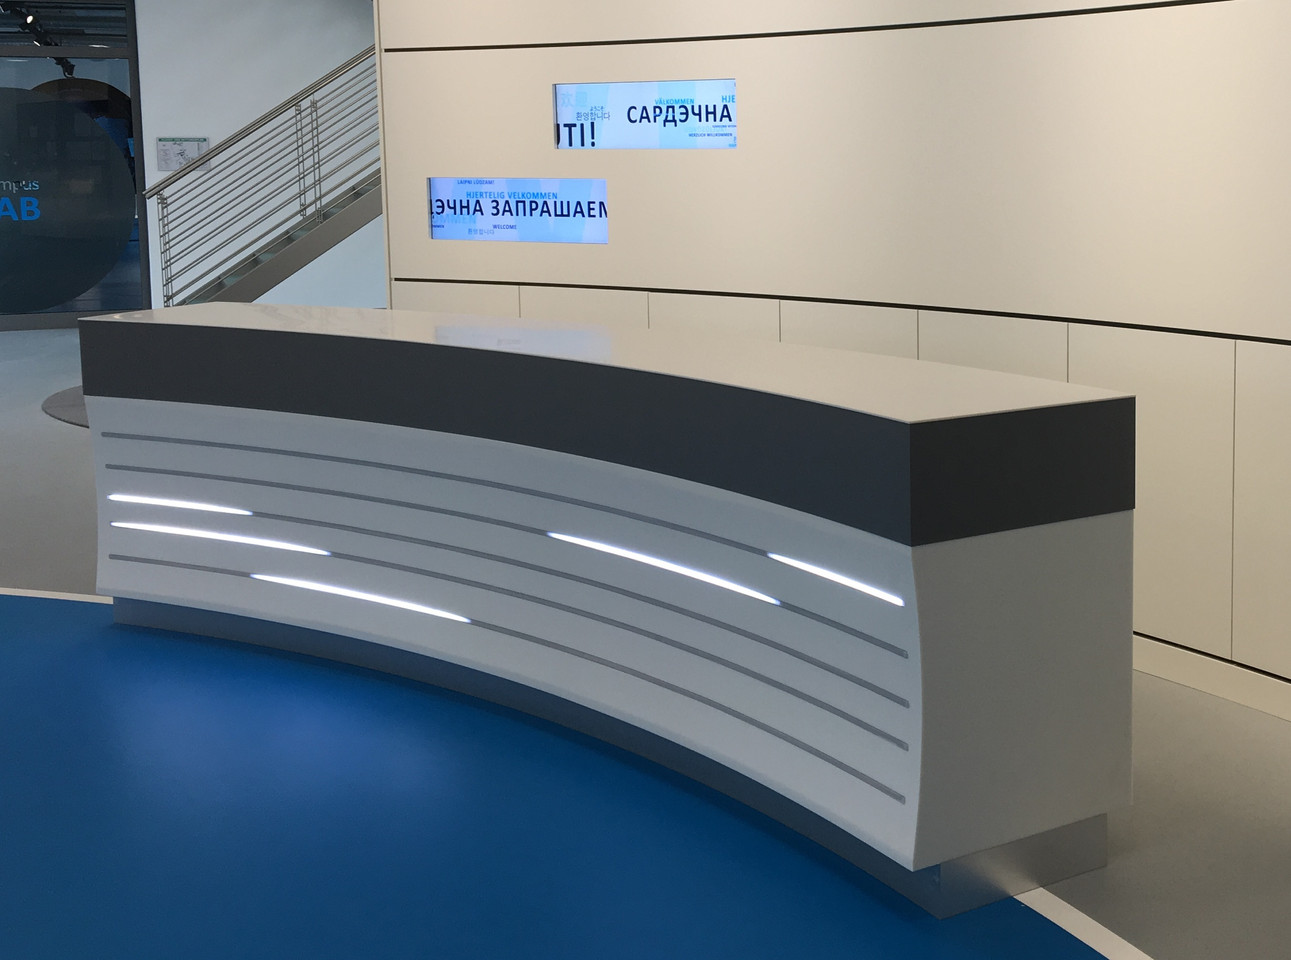 Empfangstheke LED-Effektbeleuchtung